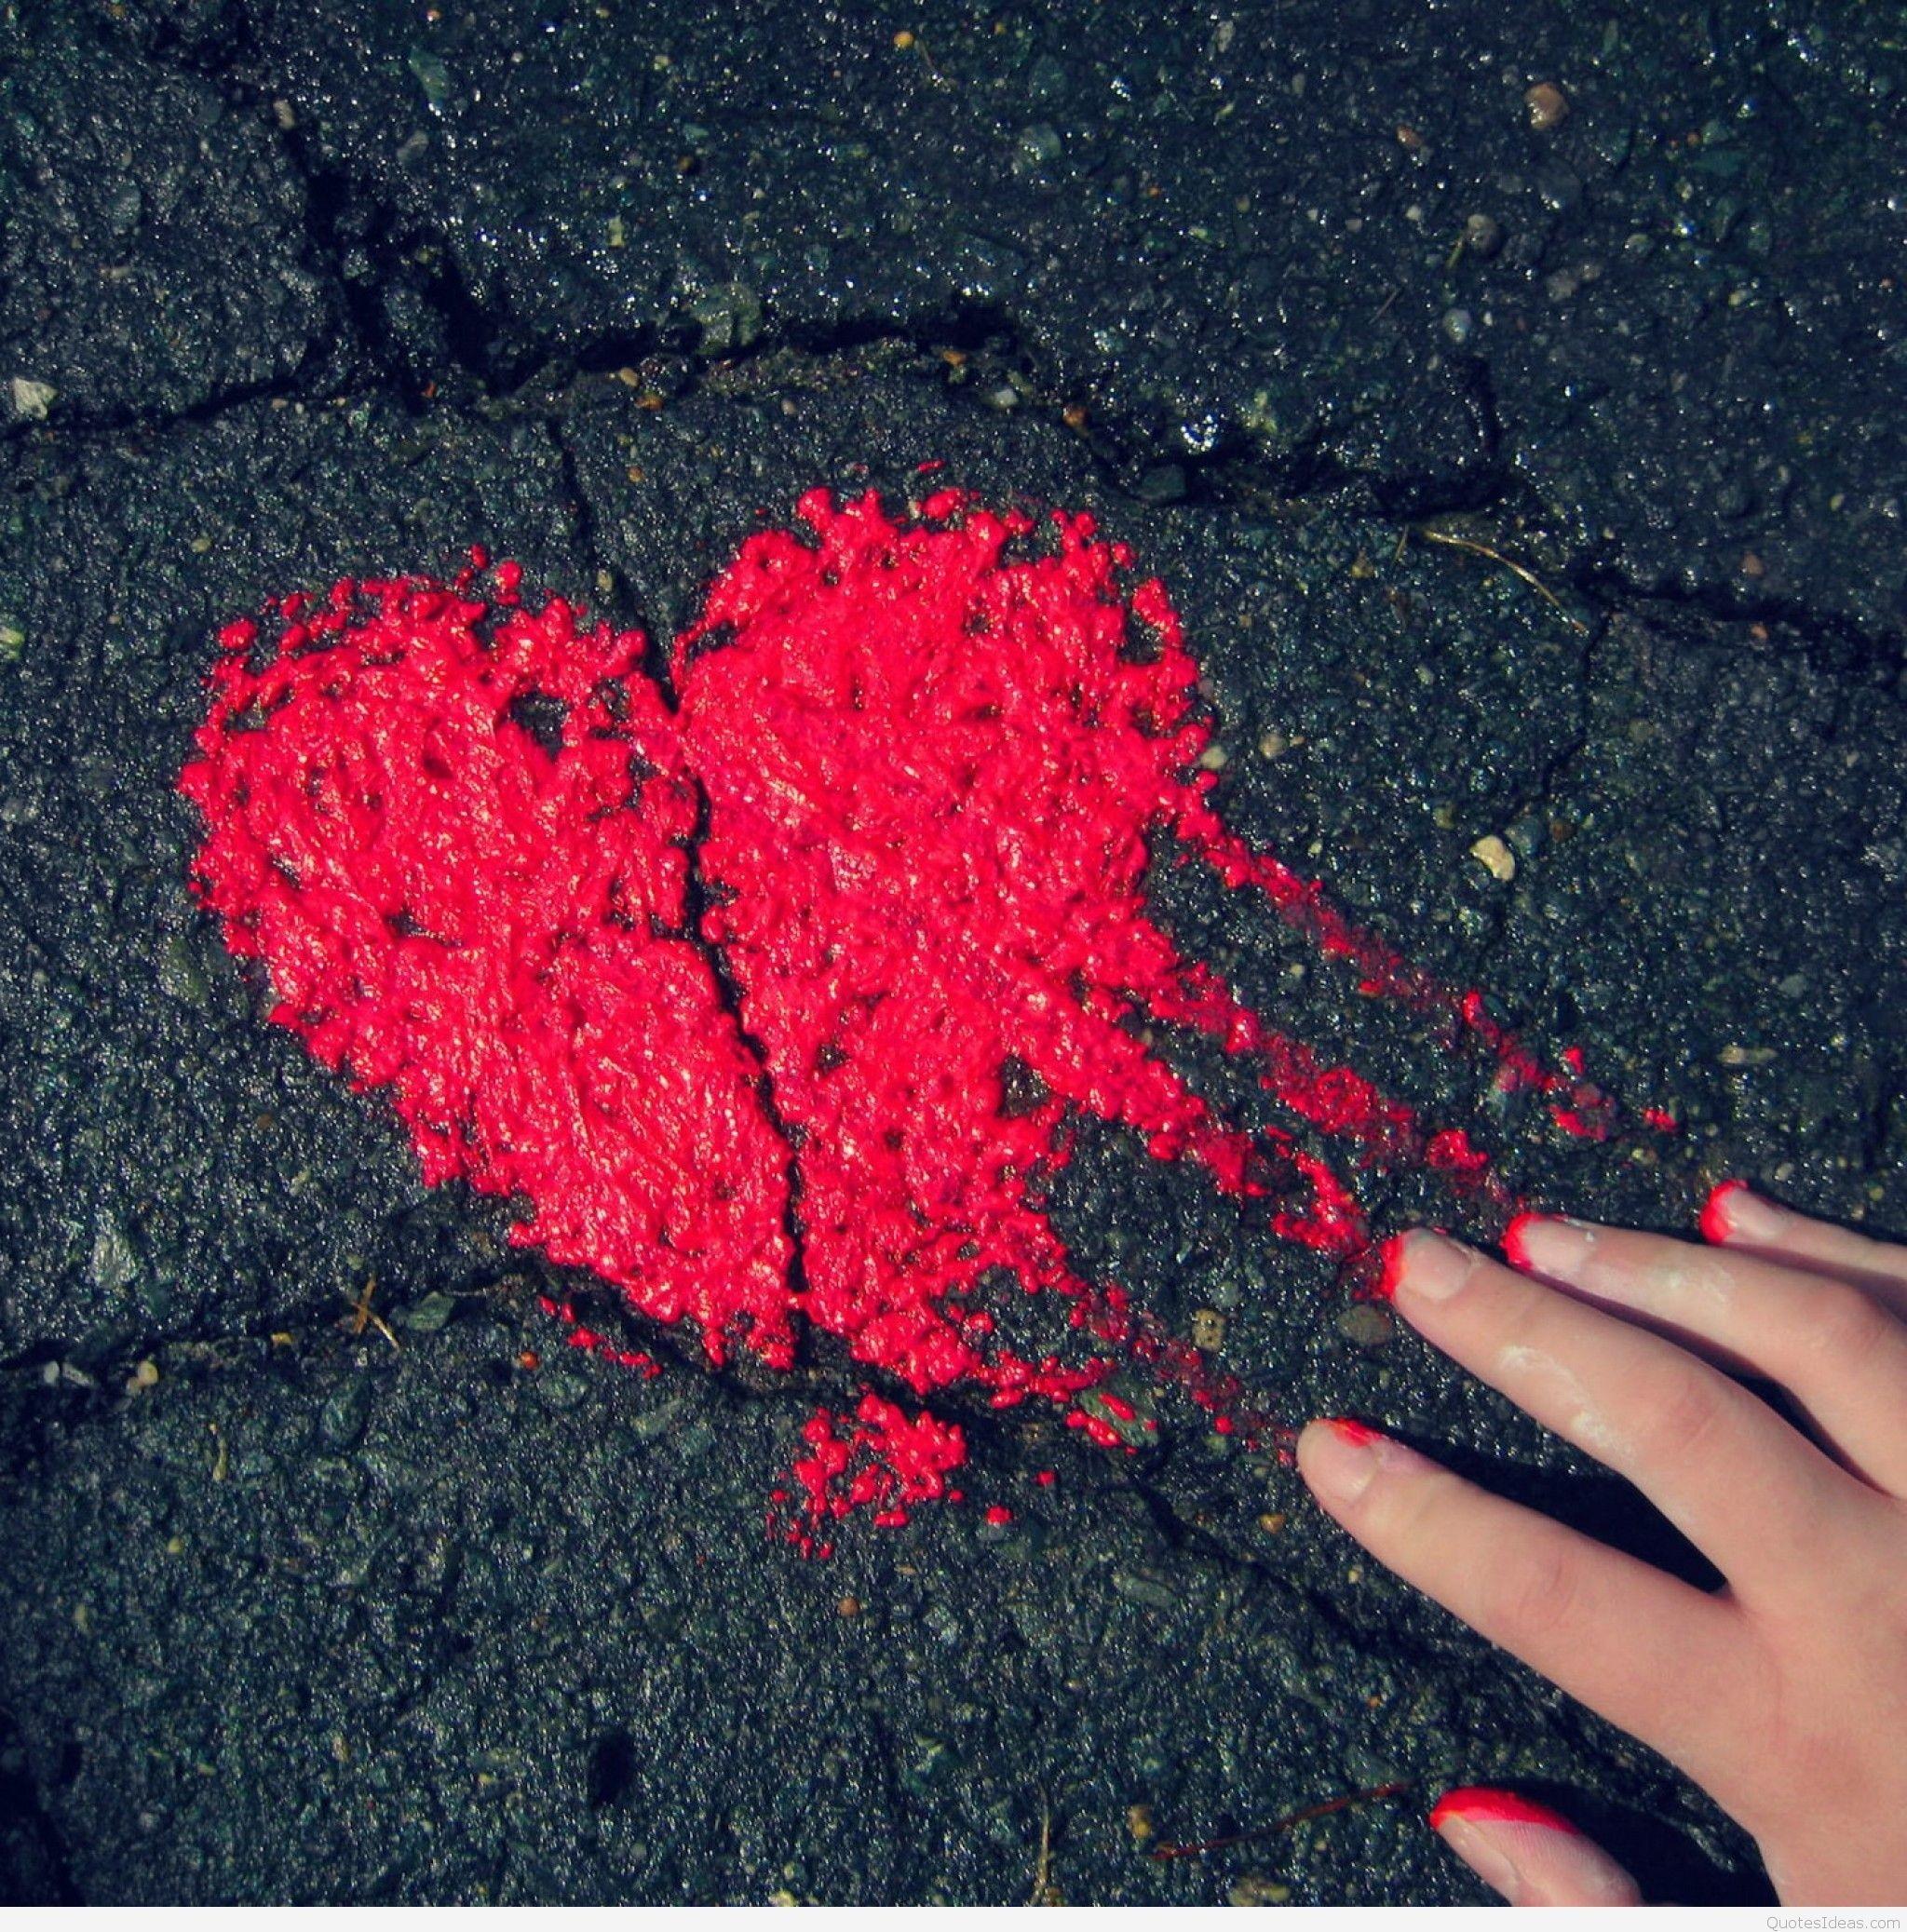 Alone Sad Girl Hd Desktop Wallpaper: Sad Heart Wallpapers (62+ Images